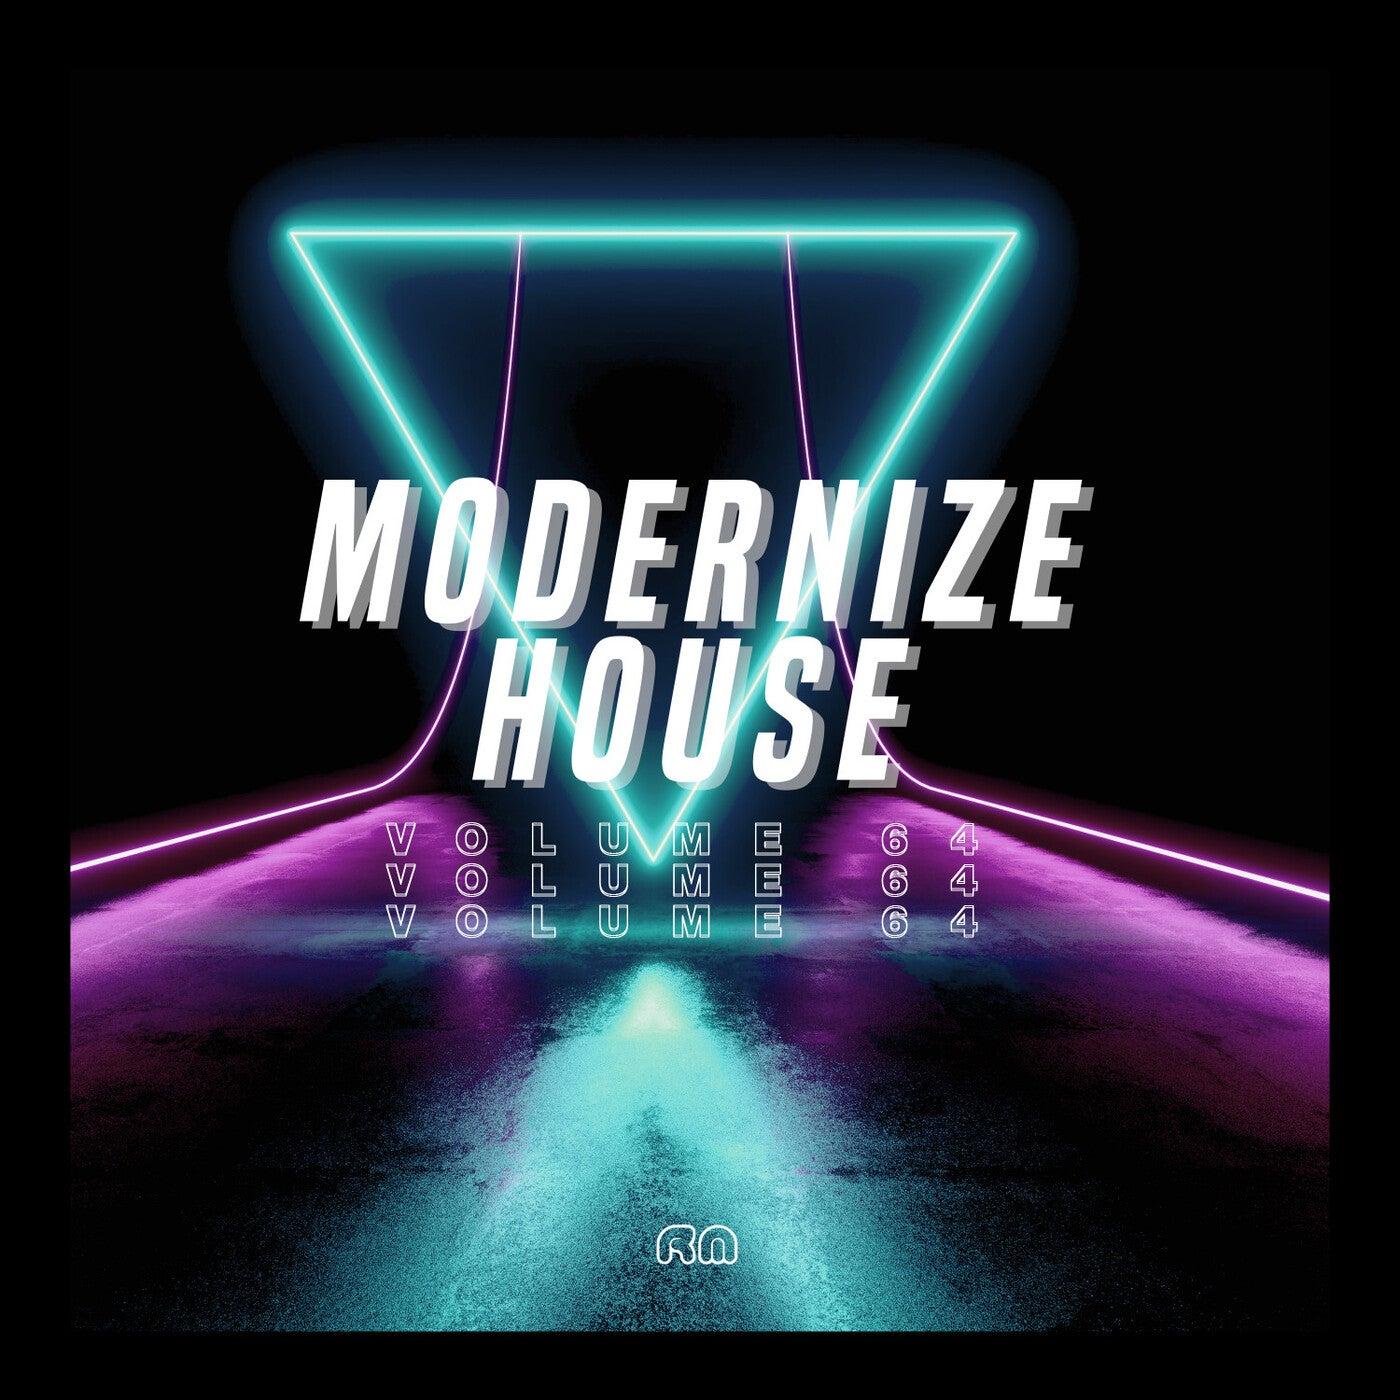 Modernize House Vol. 64